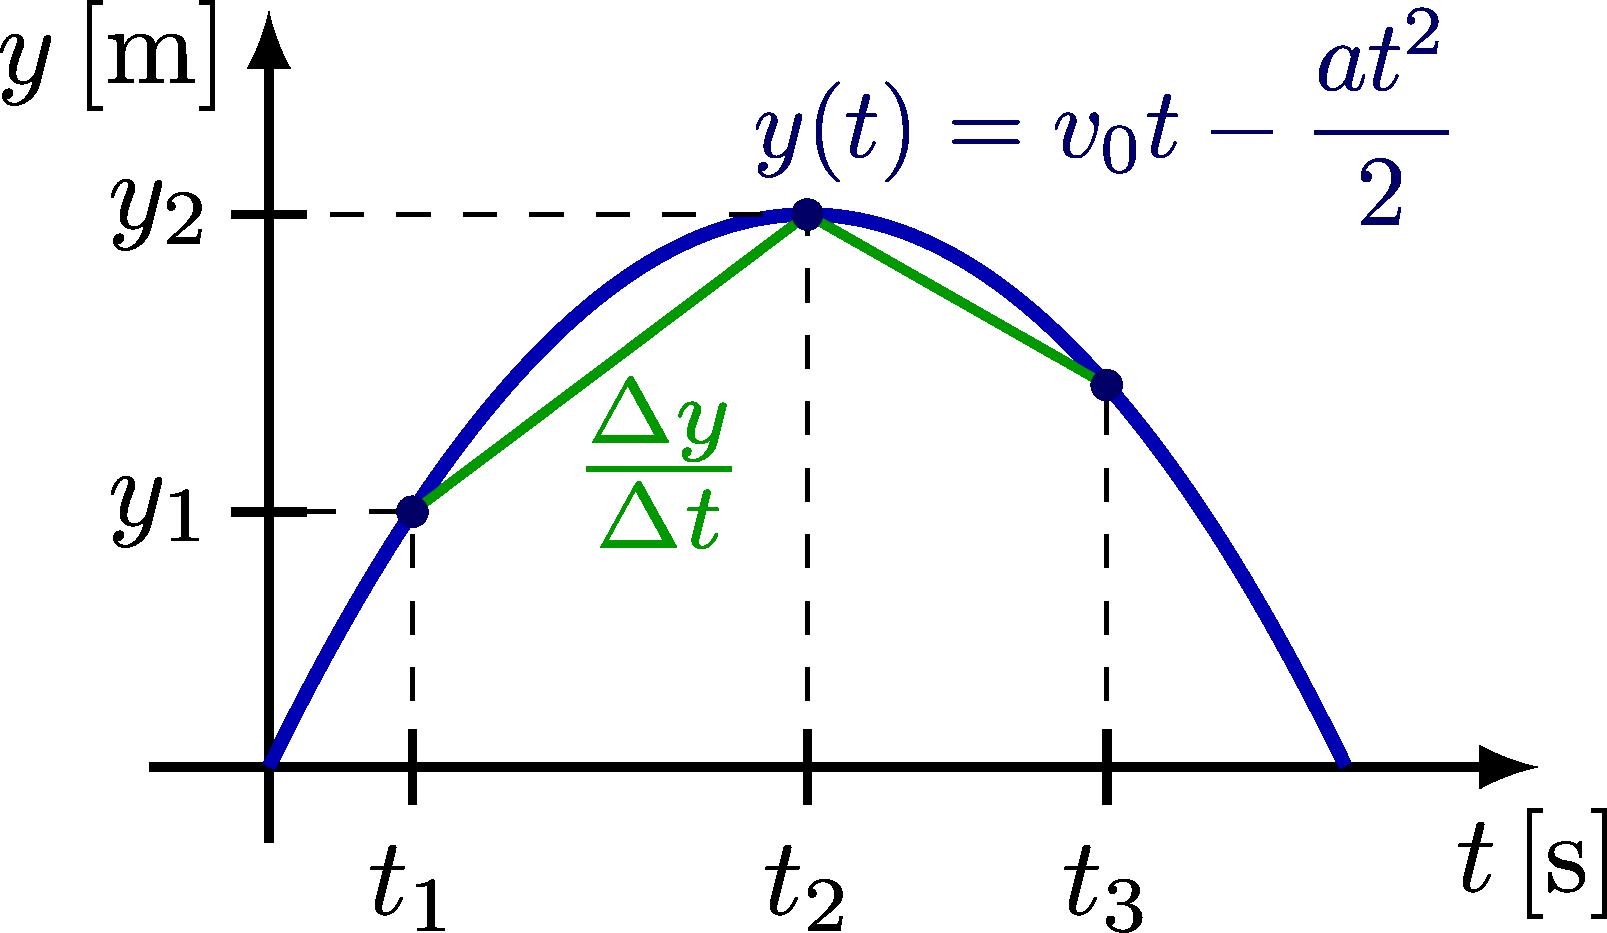 kinematics_curves-005.png